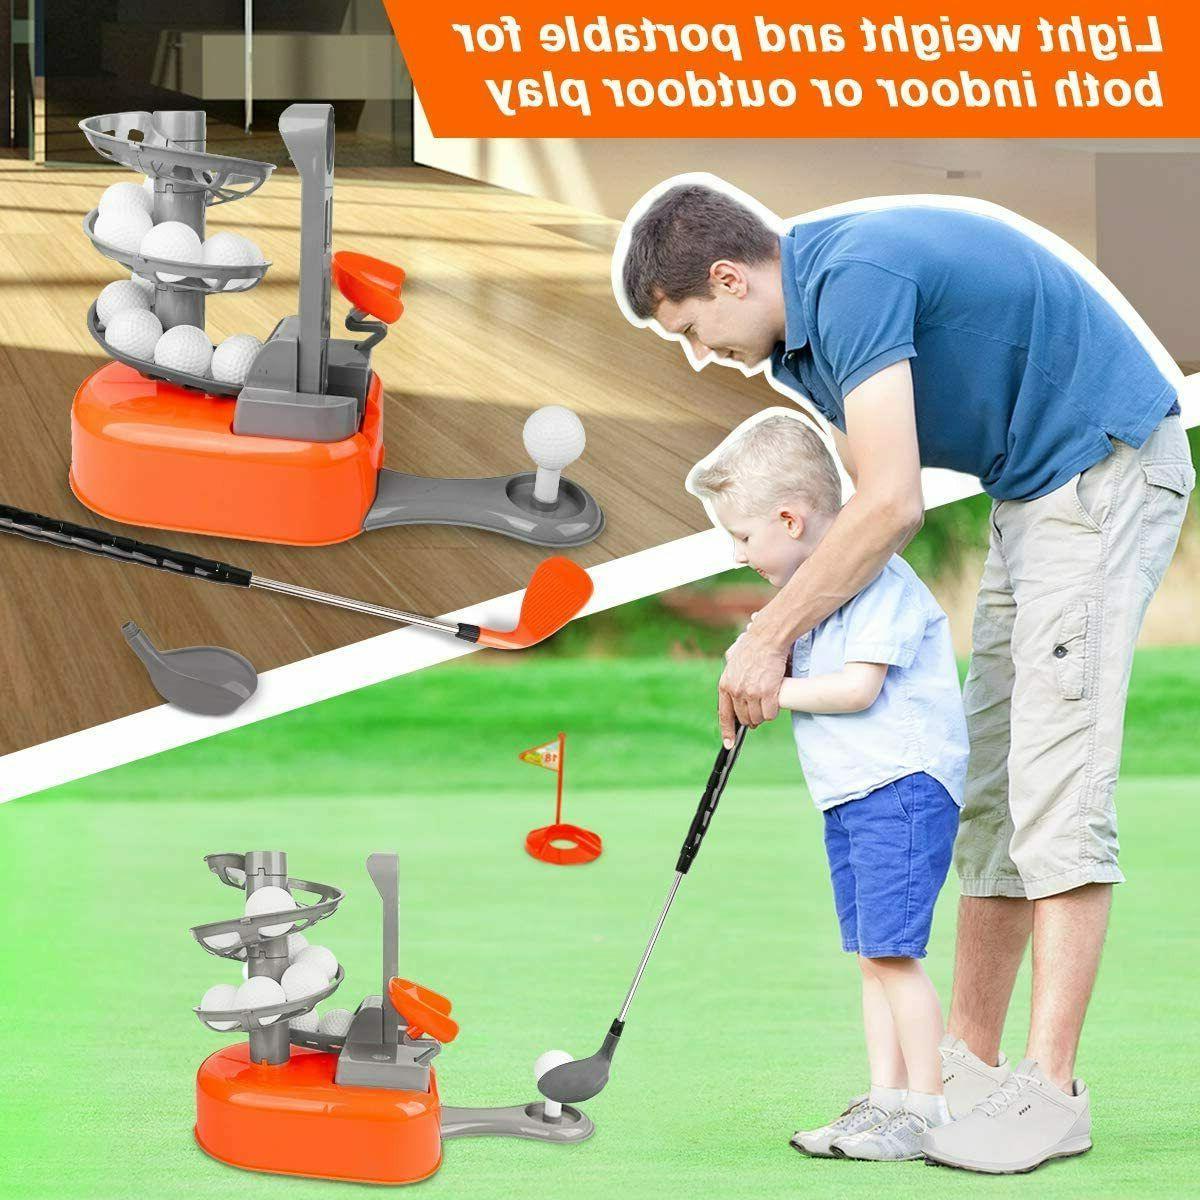 Kids Golf Set, Toddler-Golf-Clubs Toys